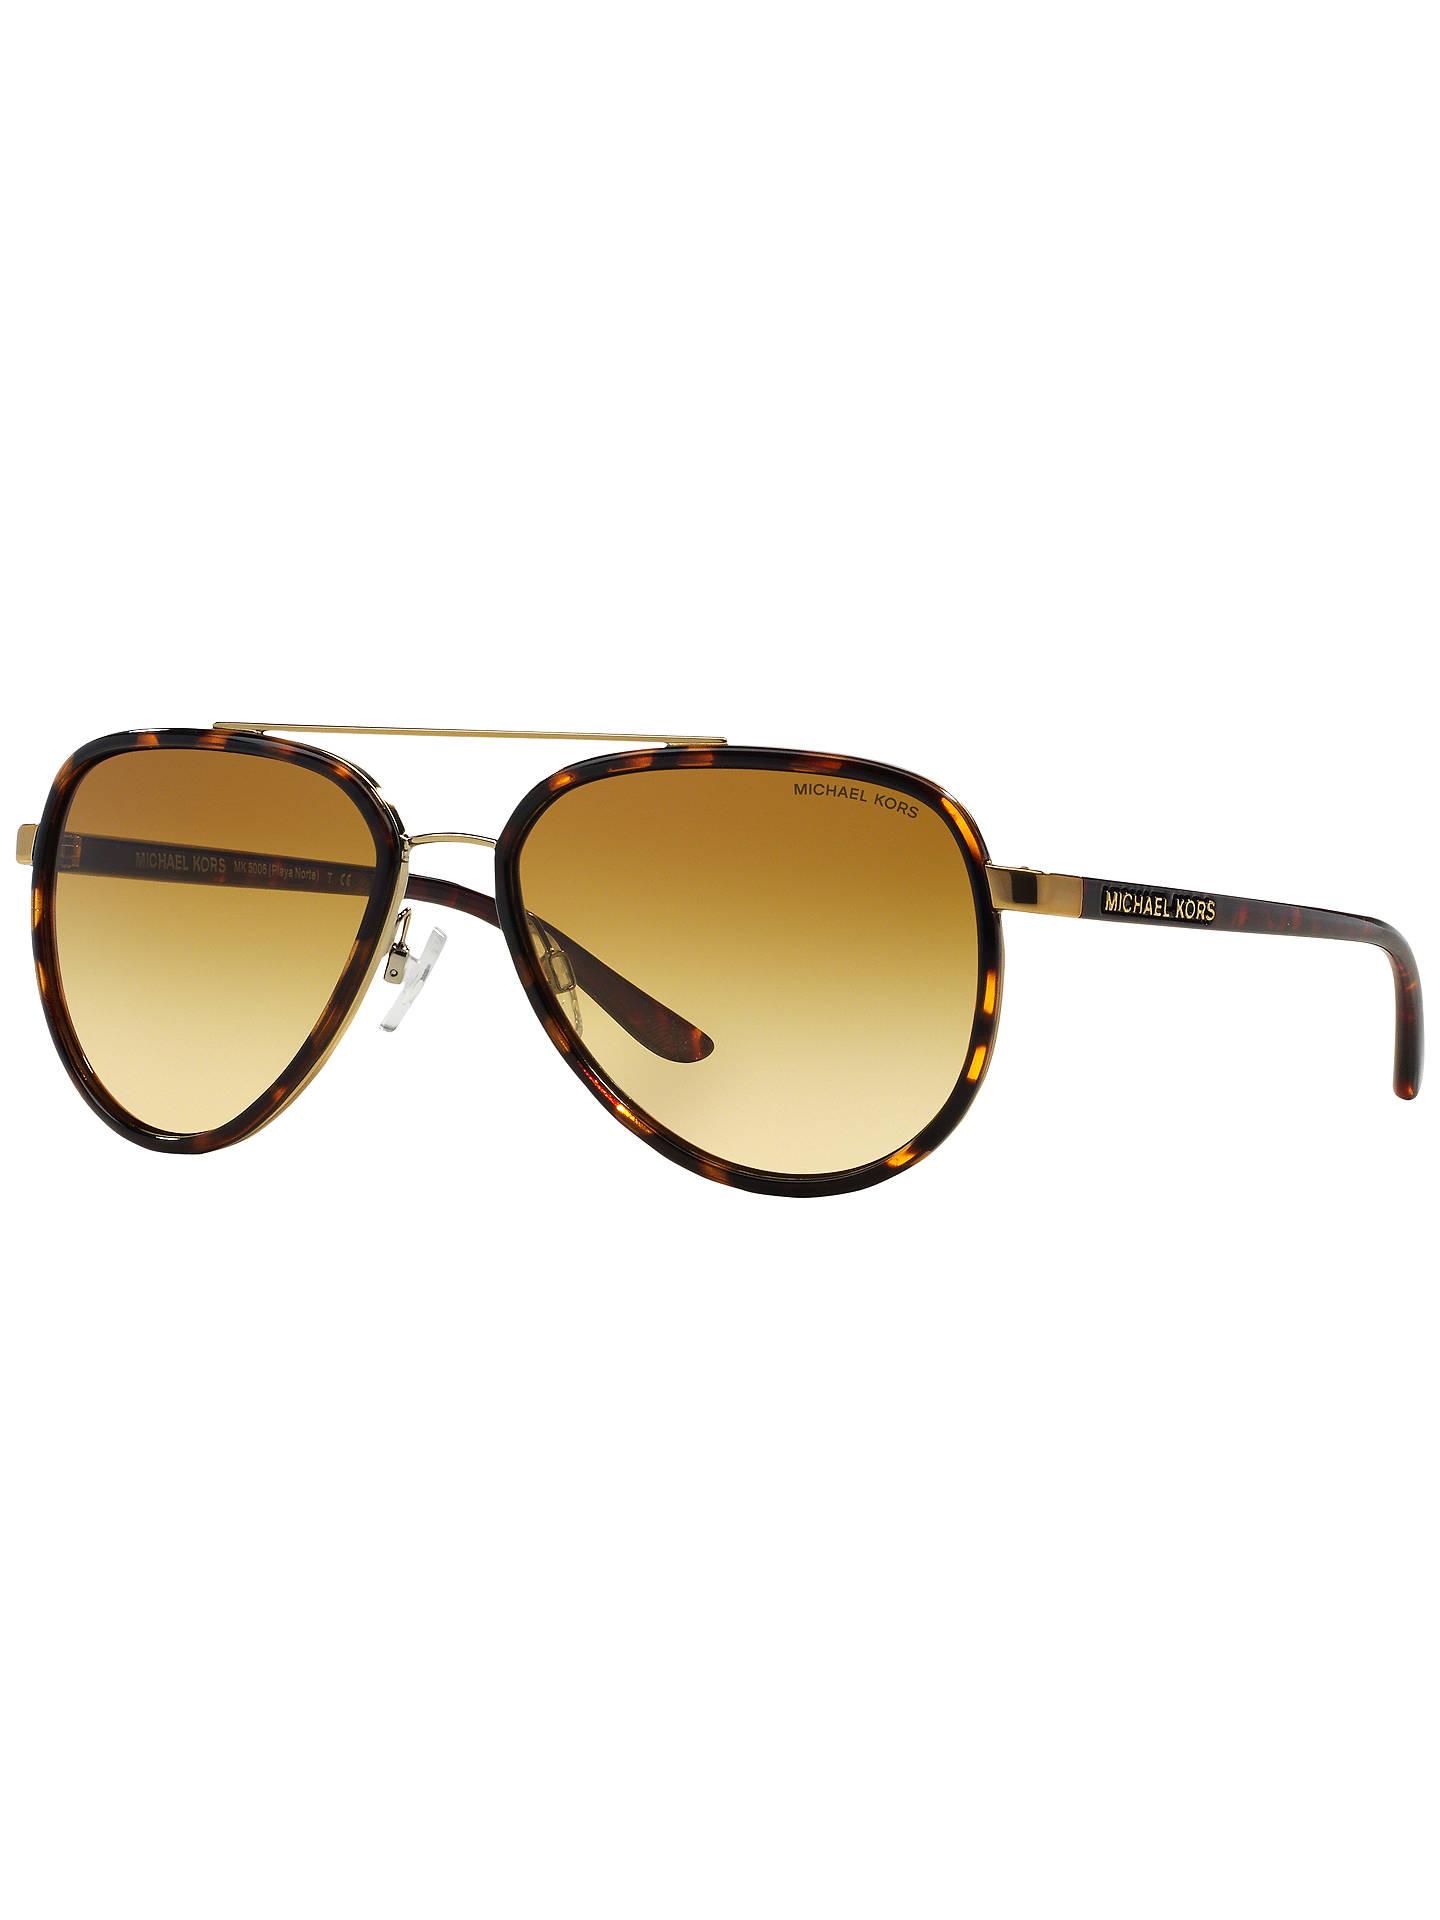 b8aa486fb9e Buy Michael Kors MK5006 Polarised Aviator Sunglasses